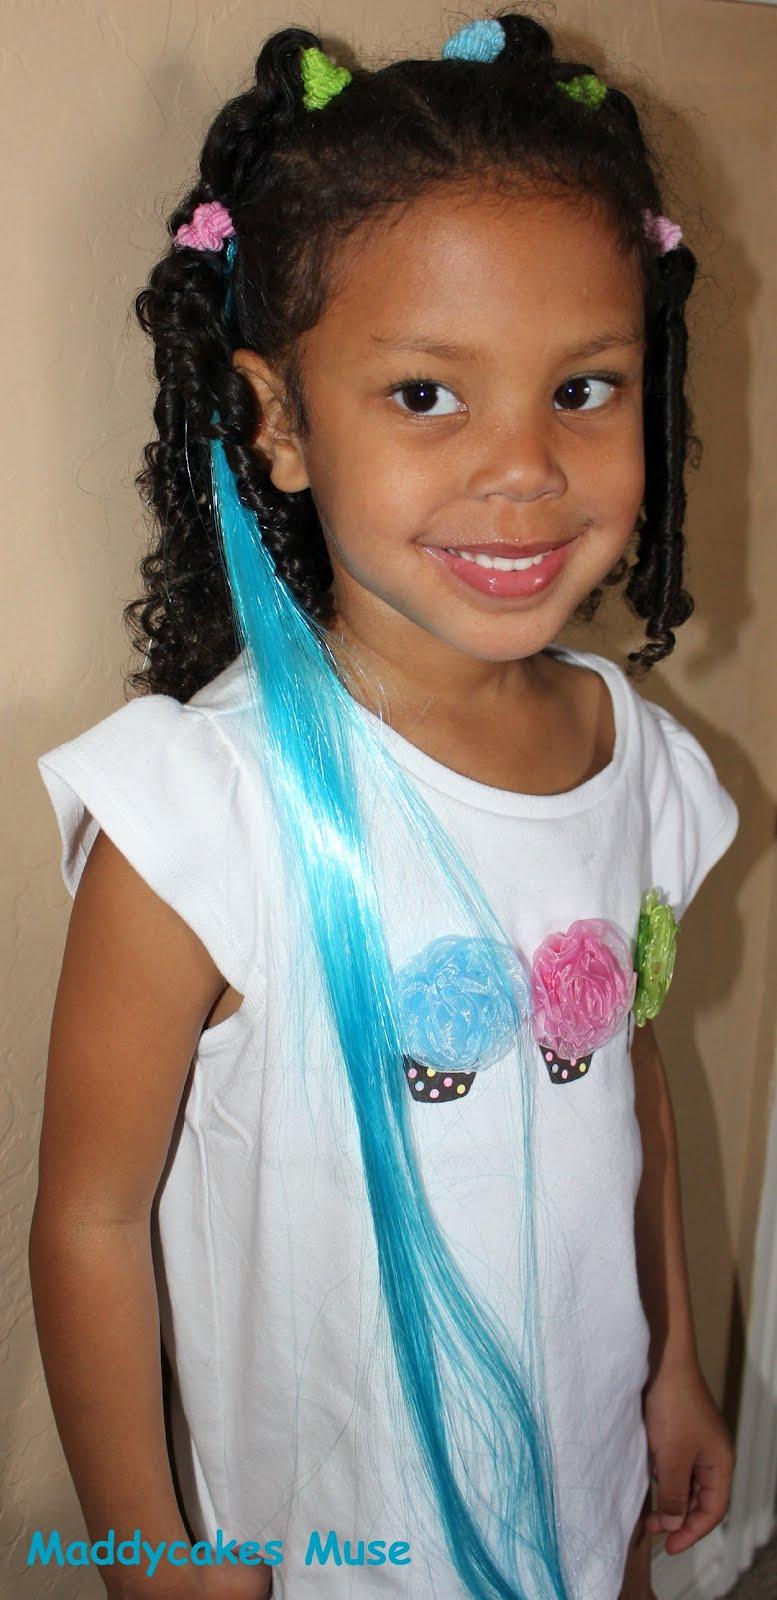 Maddycakes muse diy rock star hair extensions diy rock star hair extensions pmusecretfo Images